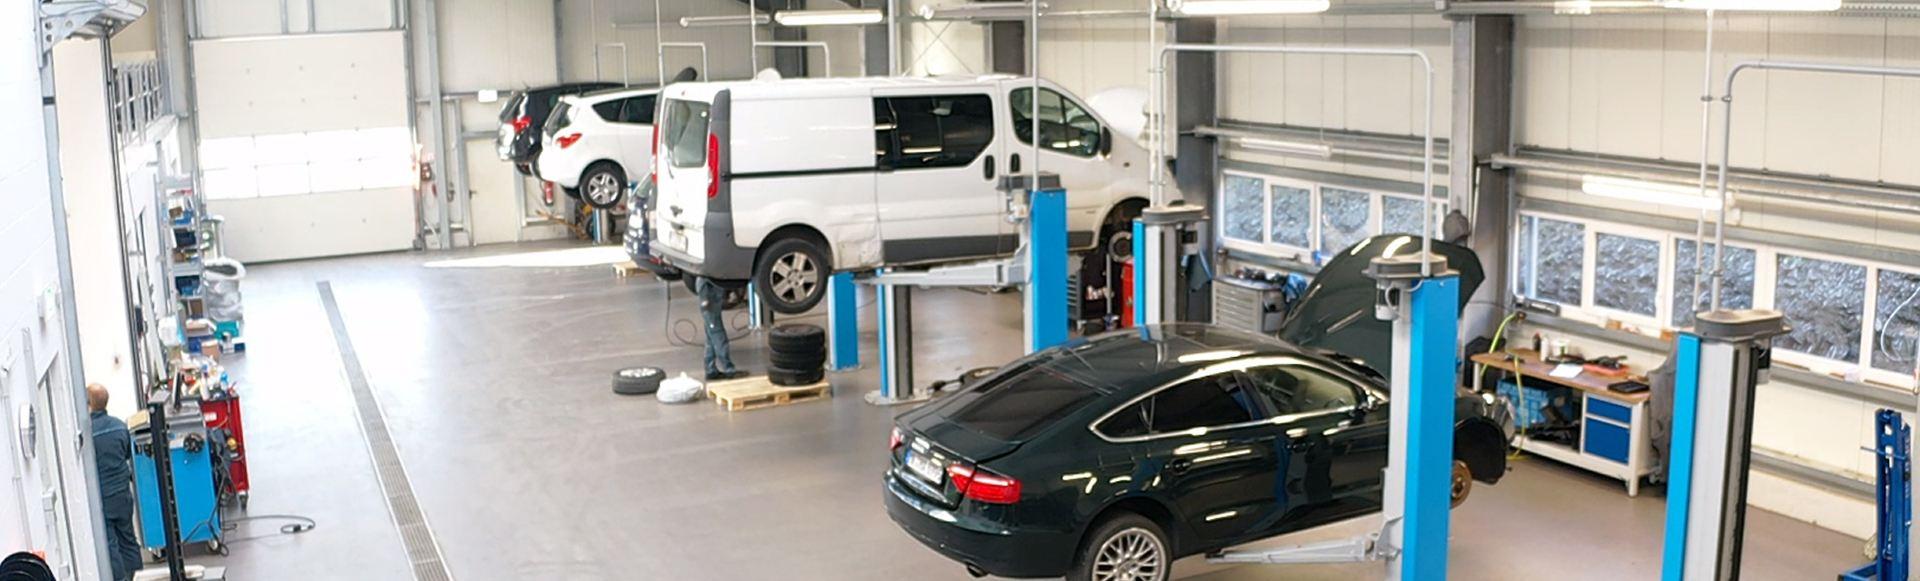 HAS-Antriebstechnik Bosch-Car-Service